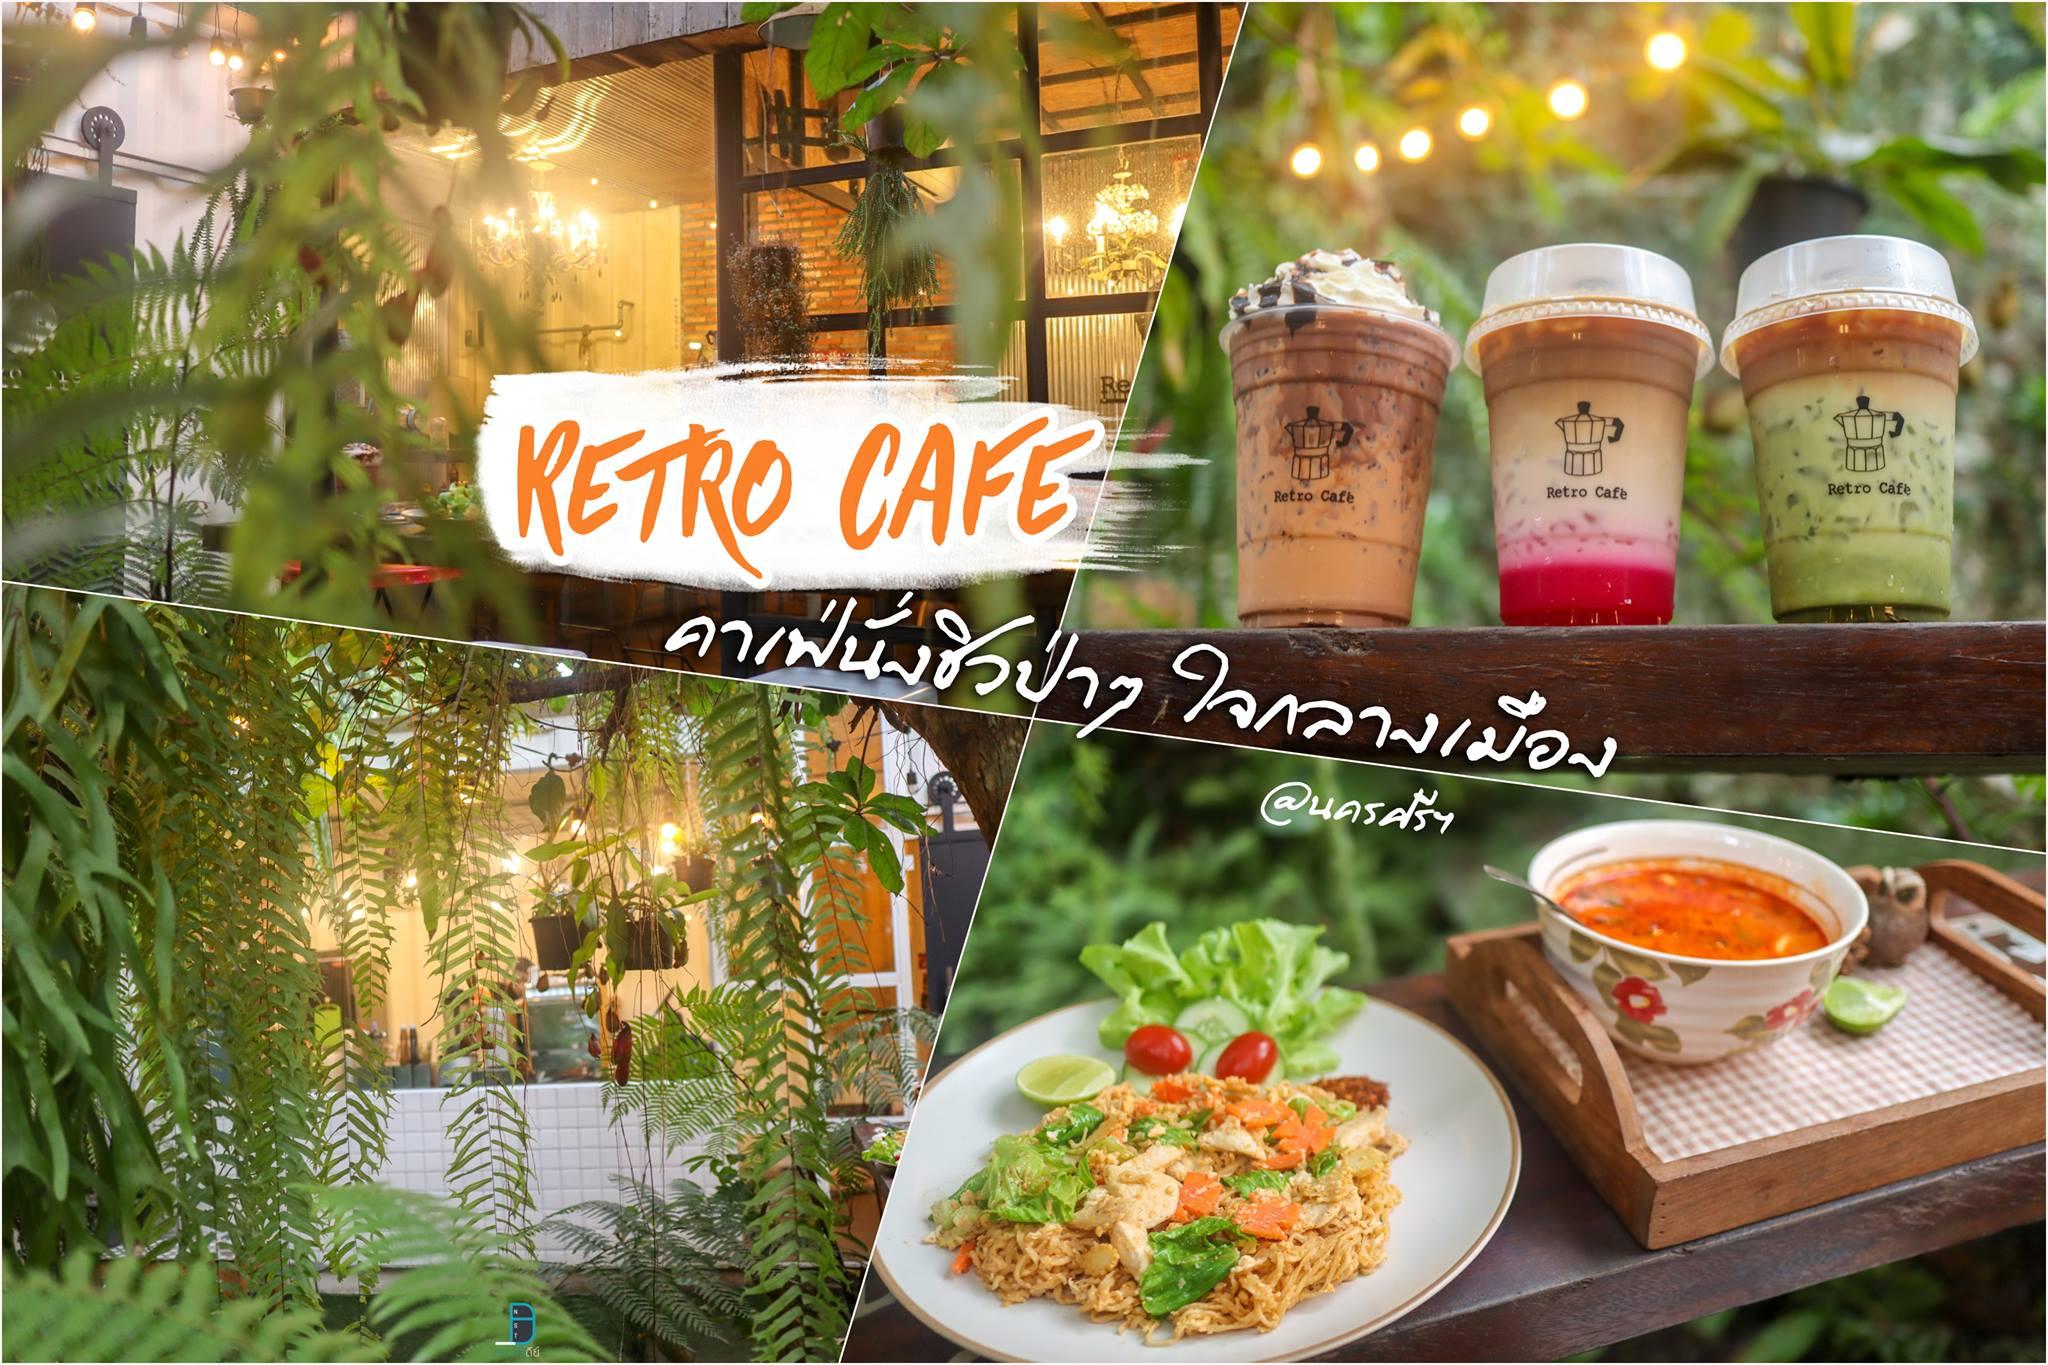 12.-Retro-Cafe ที่สุดของคาเฟ่ลับสวย-จุดถ่ายรูปจริงๆครับร้านนี้-รีวิวหลายรอบก็ยังอยากลงเพราะของเค้าดีจริง Retro-cafe-na-khon-si คาเฟ่,นครศรีธรรมราช,2021,จุดกิน,ของกิน,วิวหลักล้าน,ร้านกาแฟ